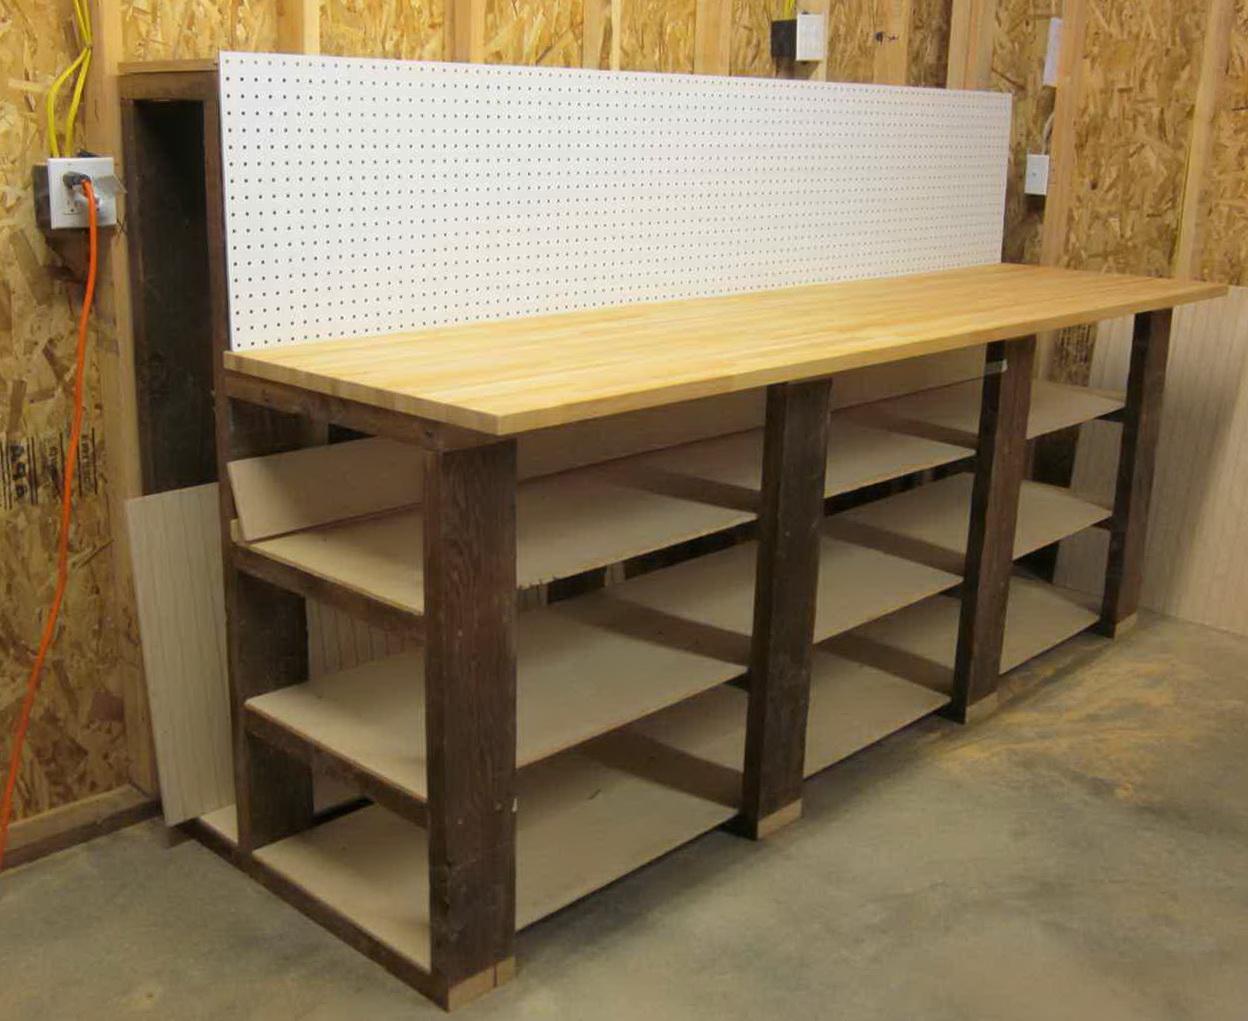 Homemade Metal Work Bench